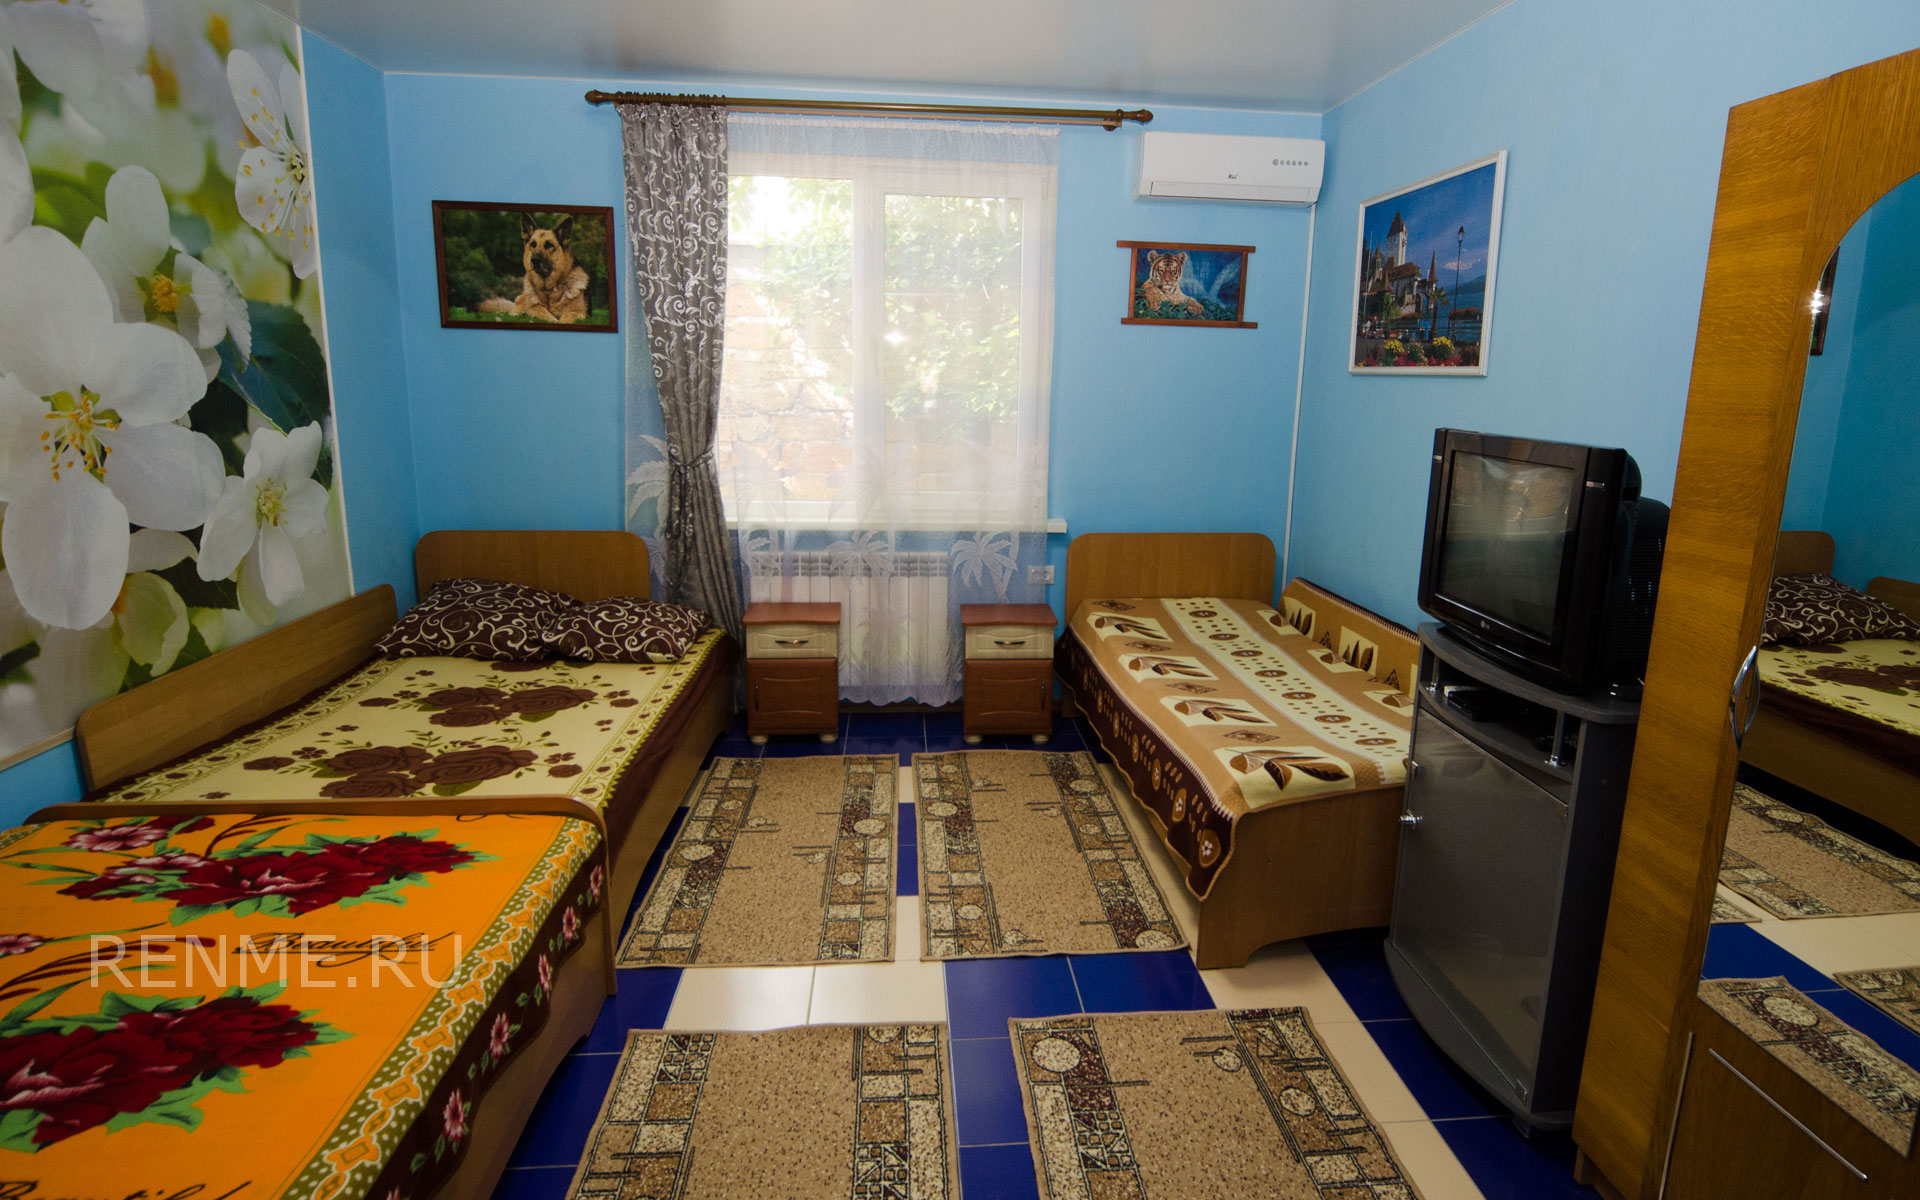 Комната. Квартира 2. 2 квартиры на ул. Гайдара. Заозёрное